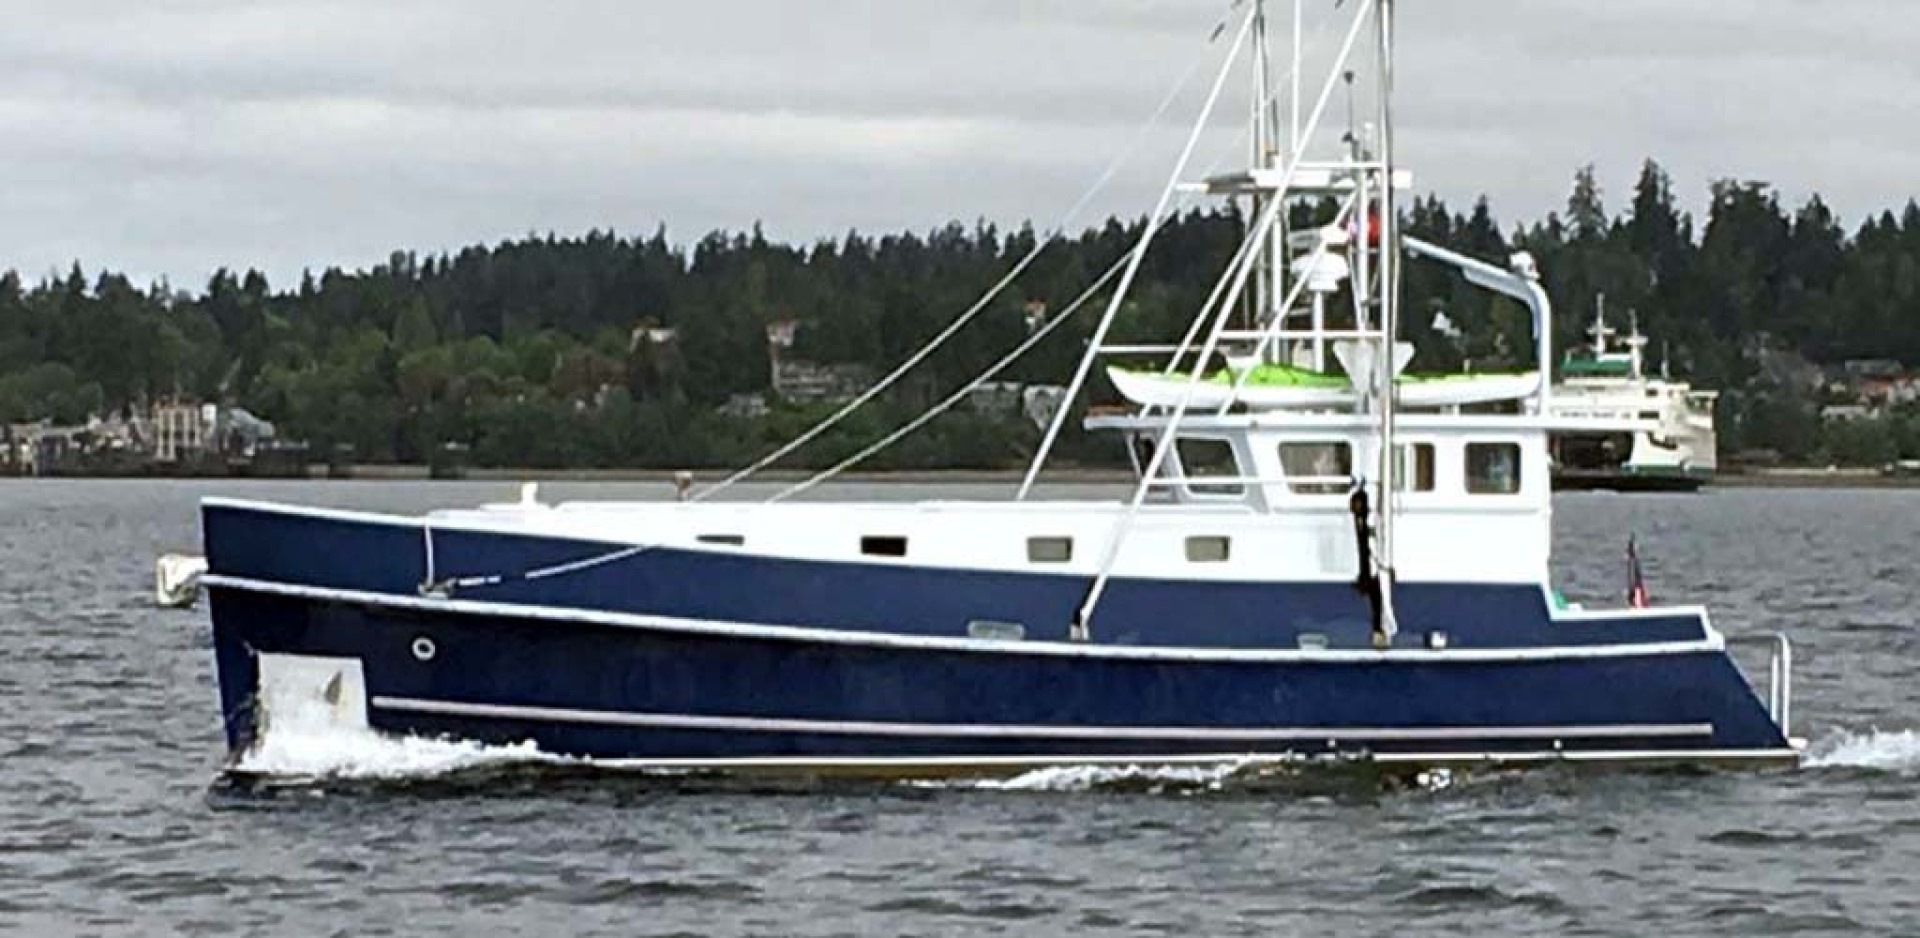 Webbers Cove-1966/2004 Custom Trawler 1966-Deja Bleu Bainbridge Island-Washington-United States-Port Profile-1093761 | Thumbnail